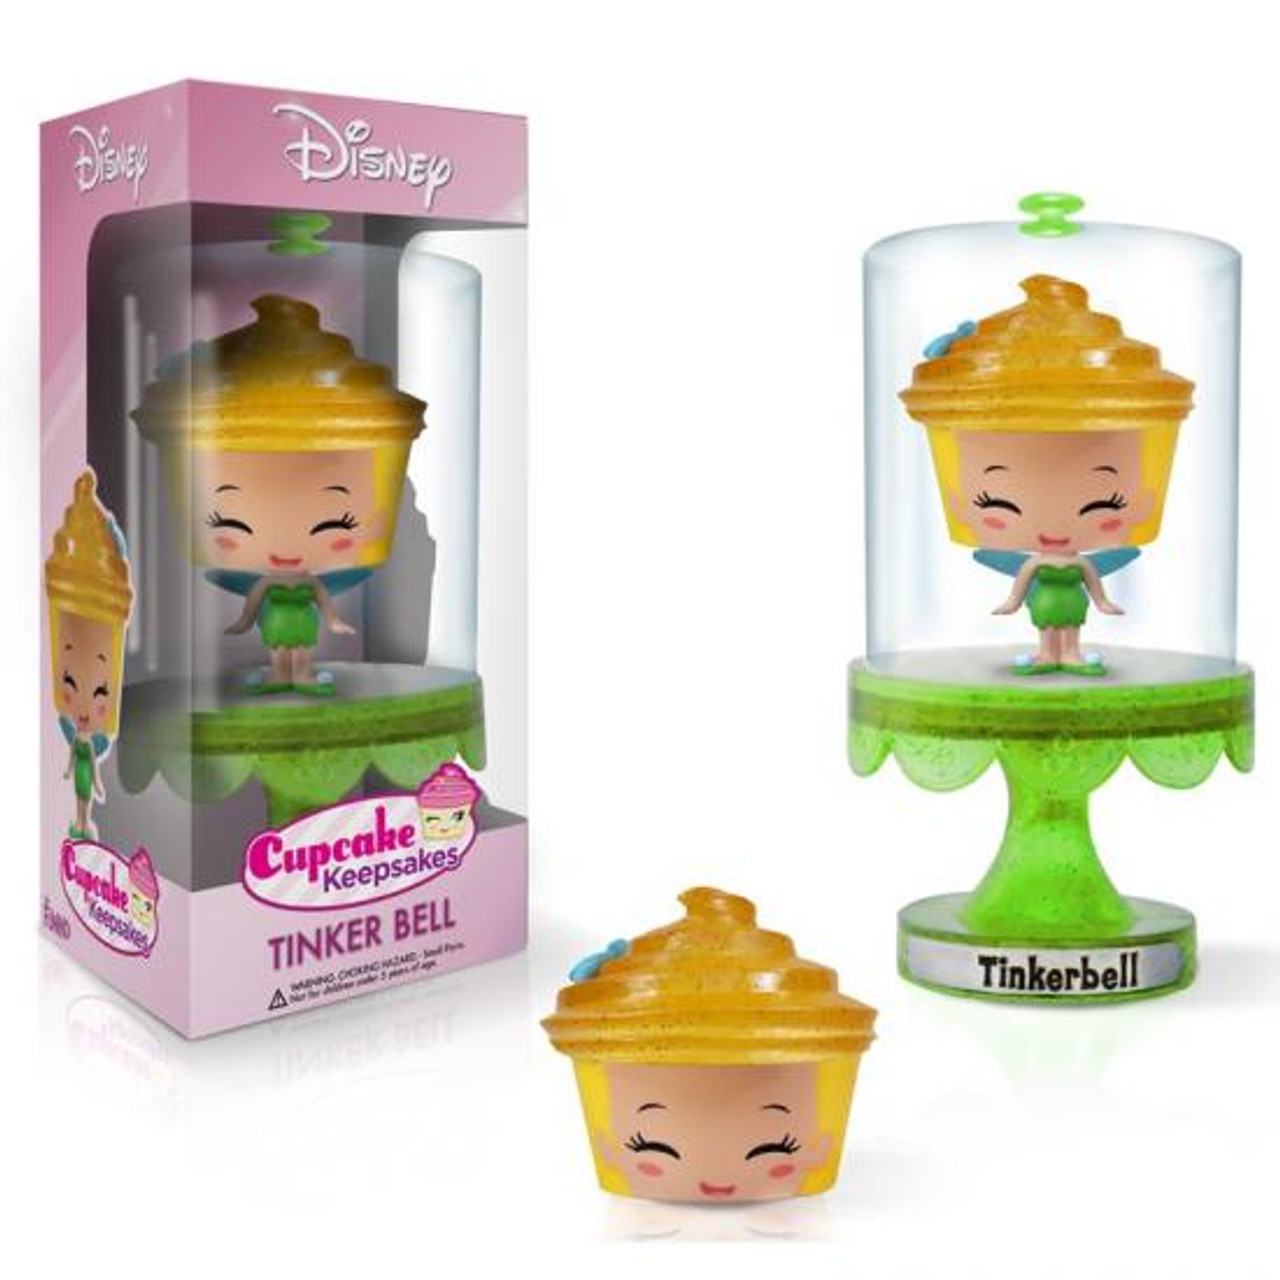 Funko Disney Fairies Cupcake Keepsakes Series 1 Tinker Bell Mini Figure [Peter Pan]